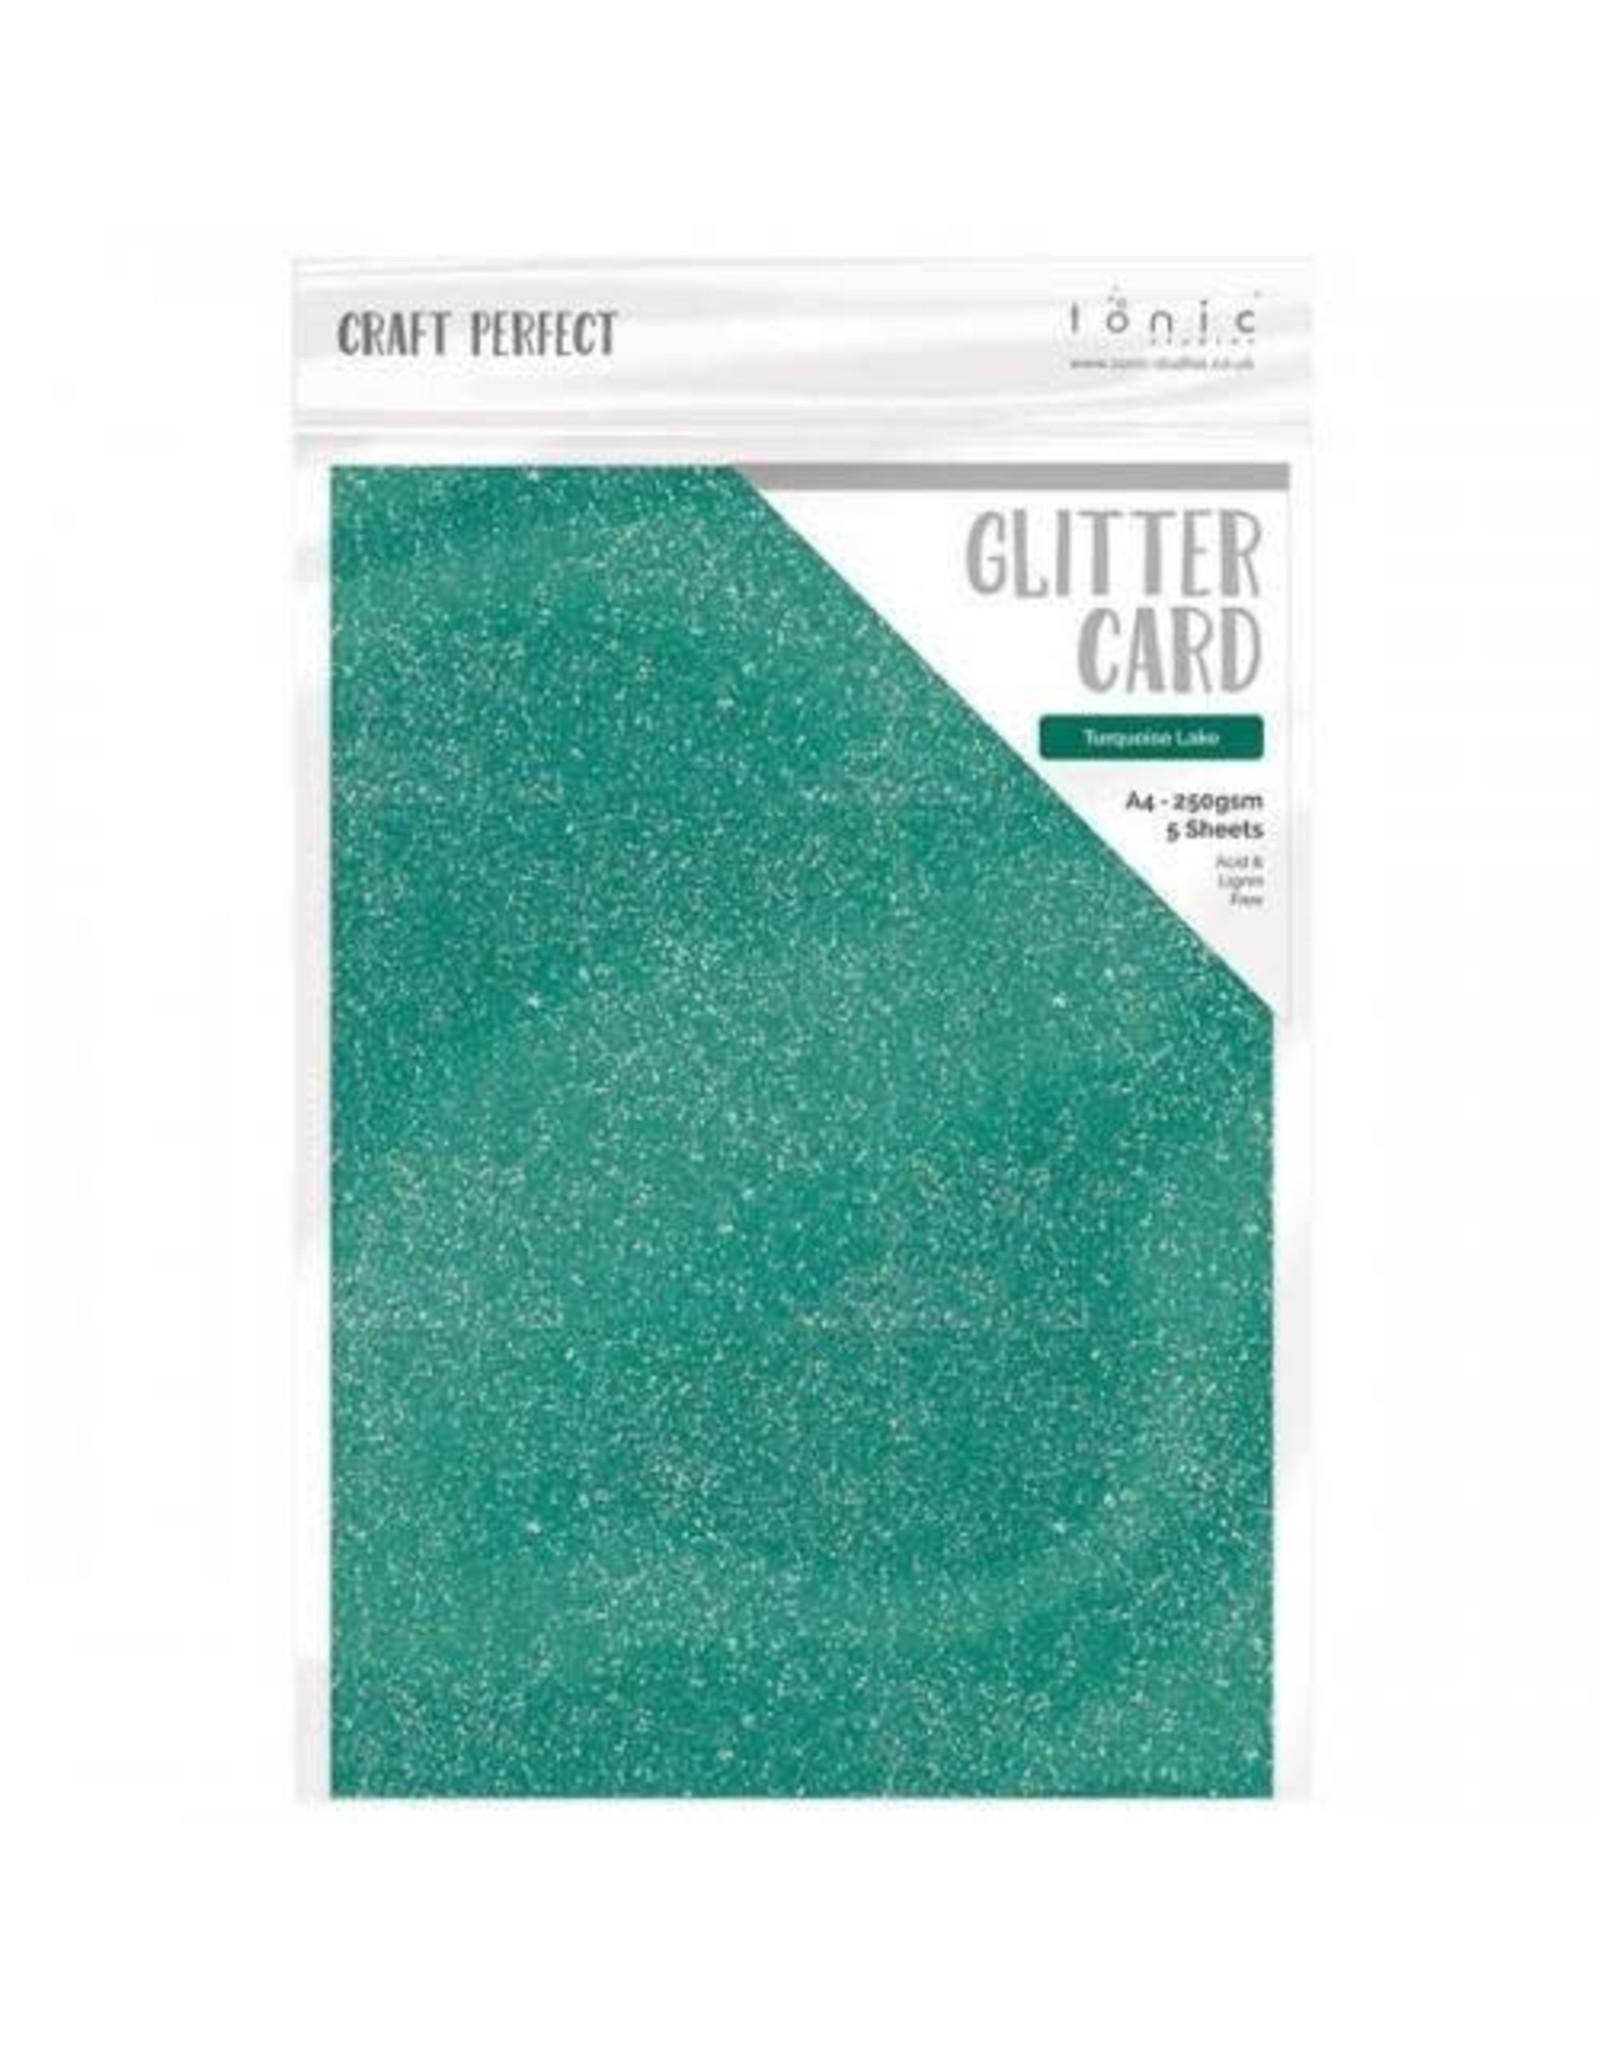 Tonic Studio Turquoise Lake - A4 Glitter Card